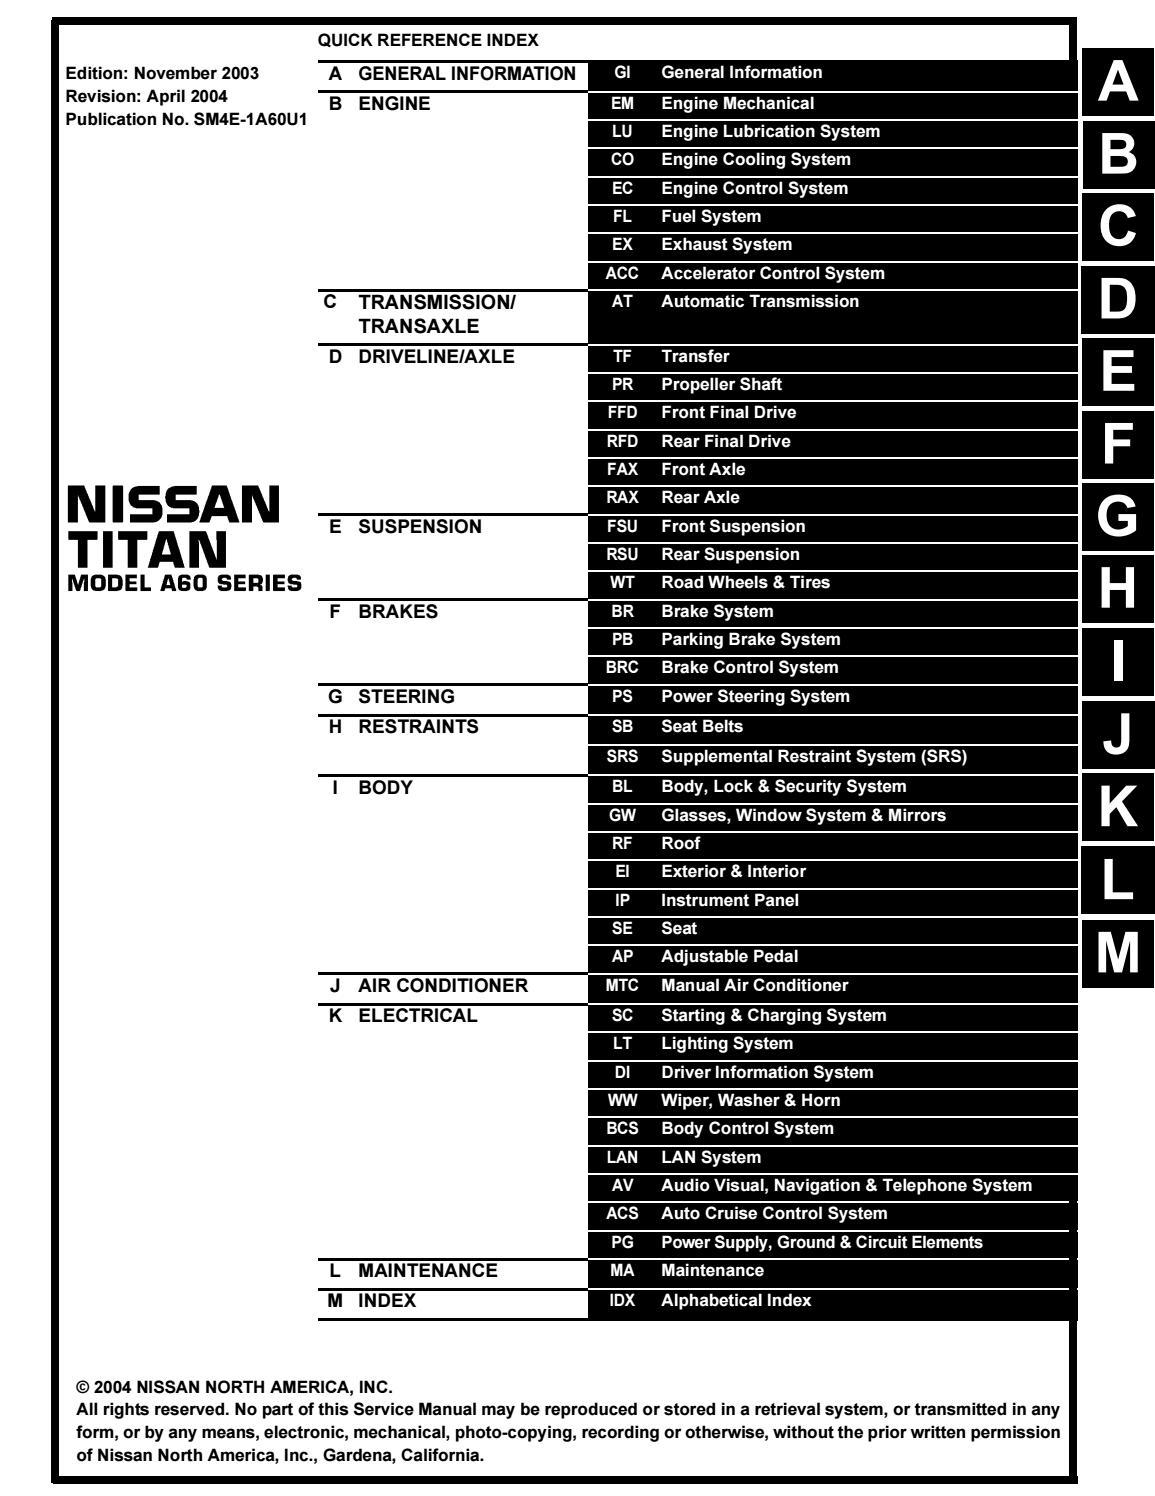 2004 Nissan Titan Oil Capacity : nissan, titan, capacity, Nissan, Titan, Service, Repair, Manual, 163615, Issuu